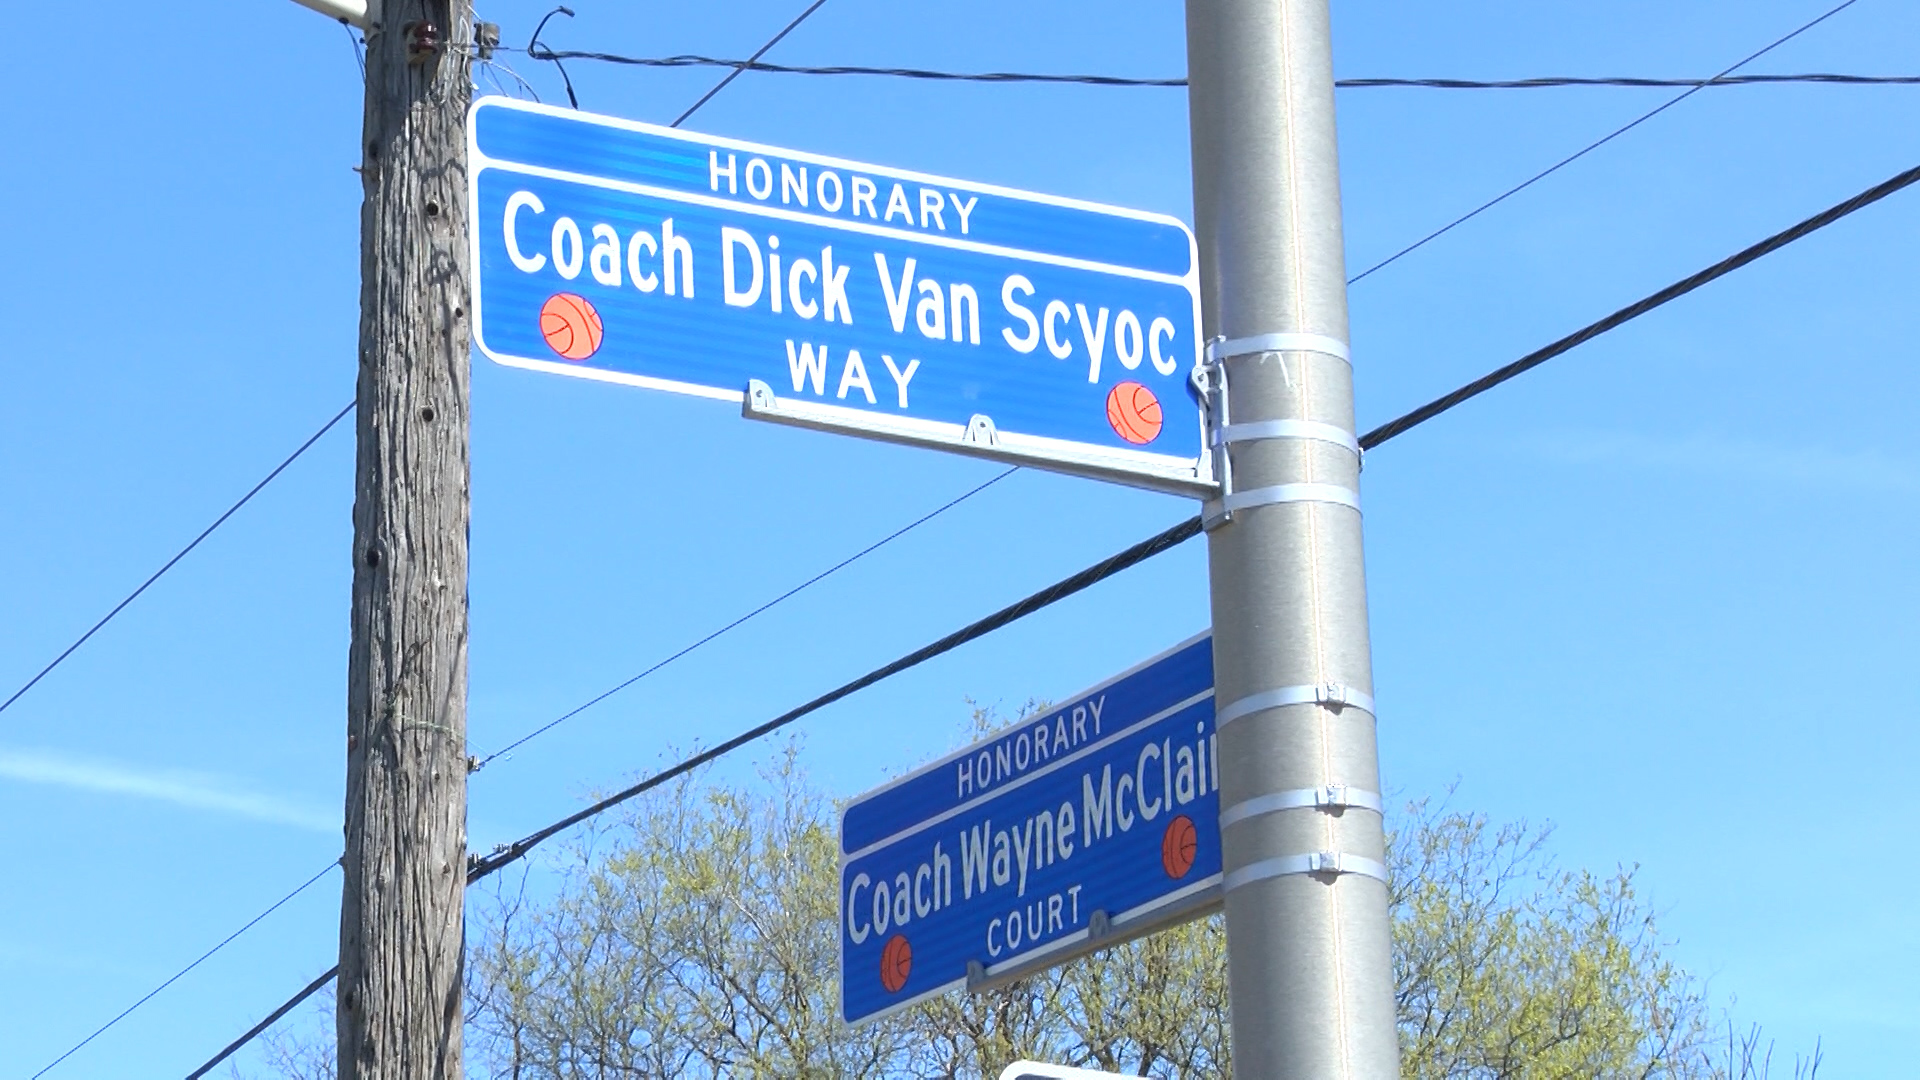 Coach Dick Van Scyoc Way_1460266258675.jpg